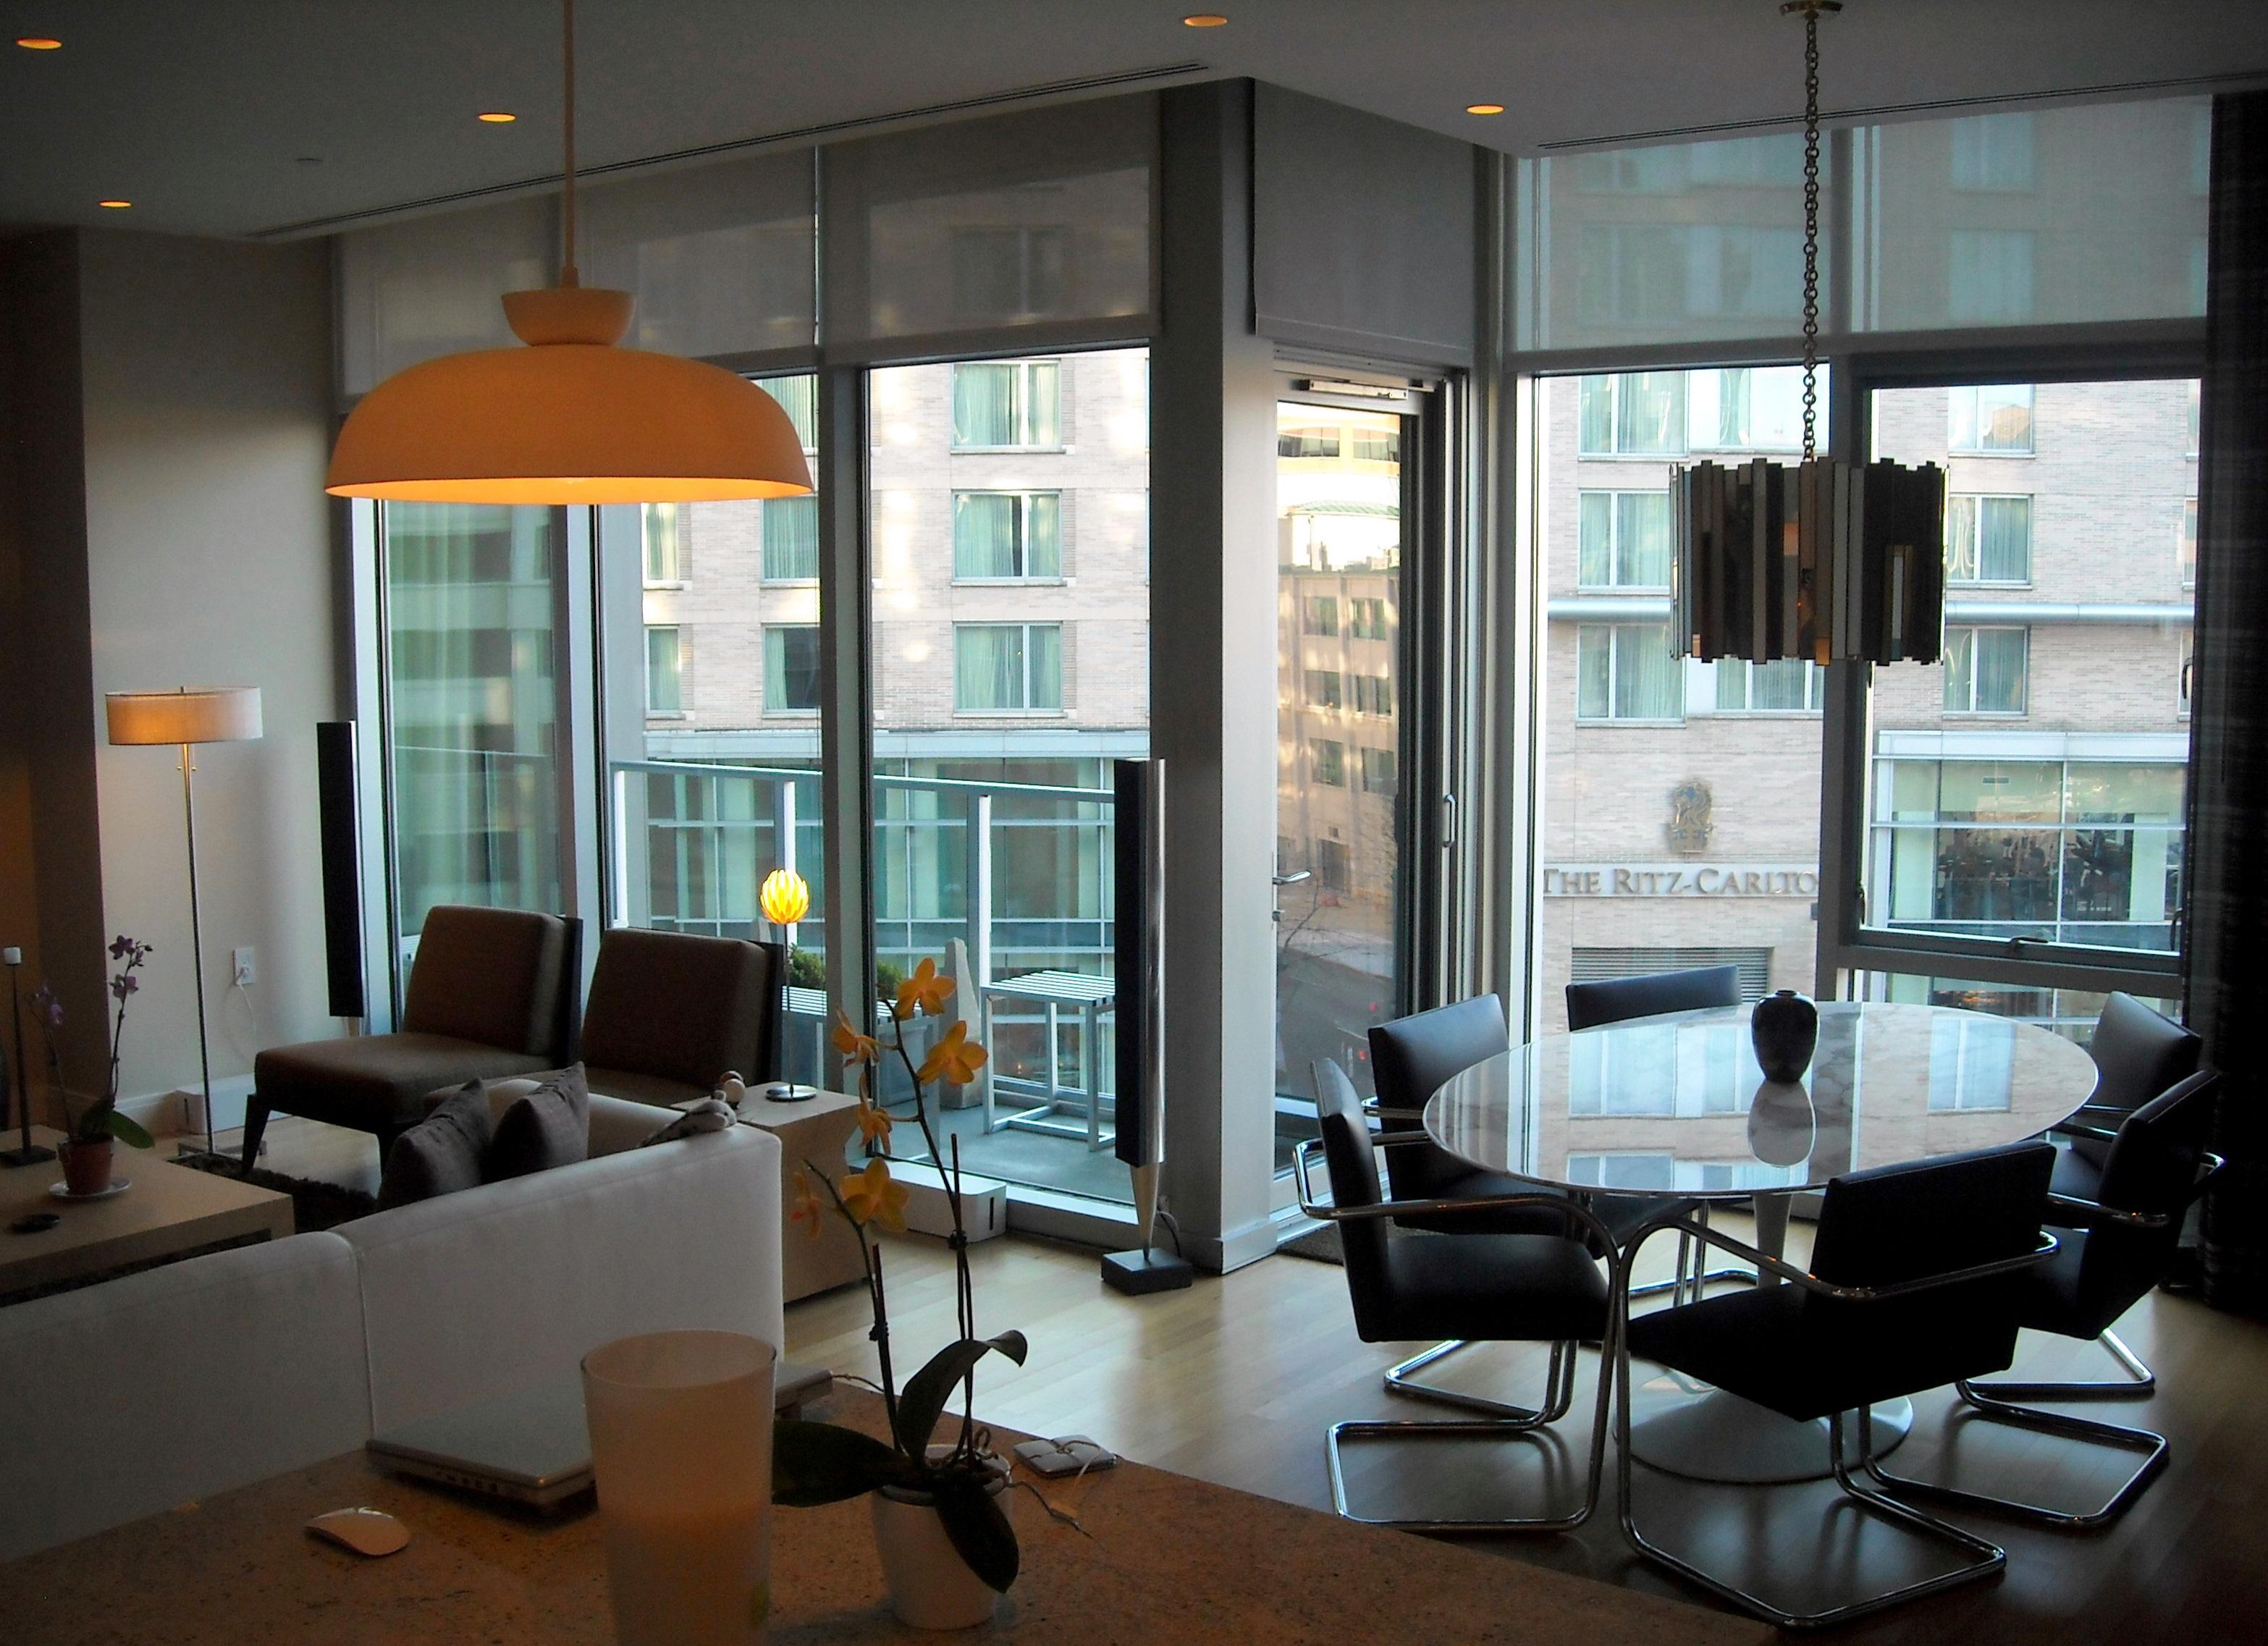 File:22 West - interior view - Ritz Carlton sign.jpg - Wikimedia ...